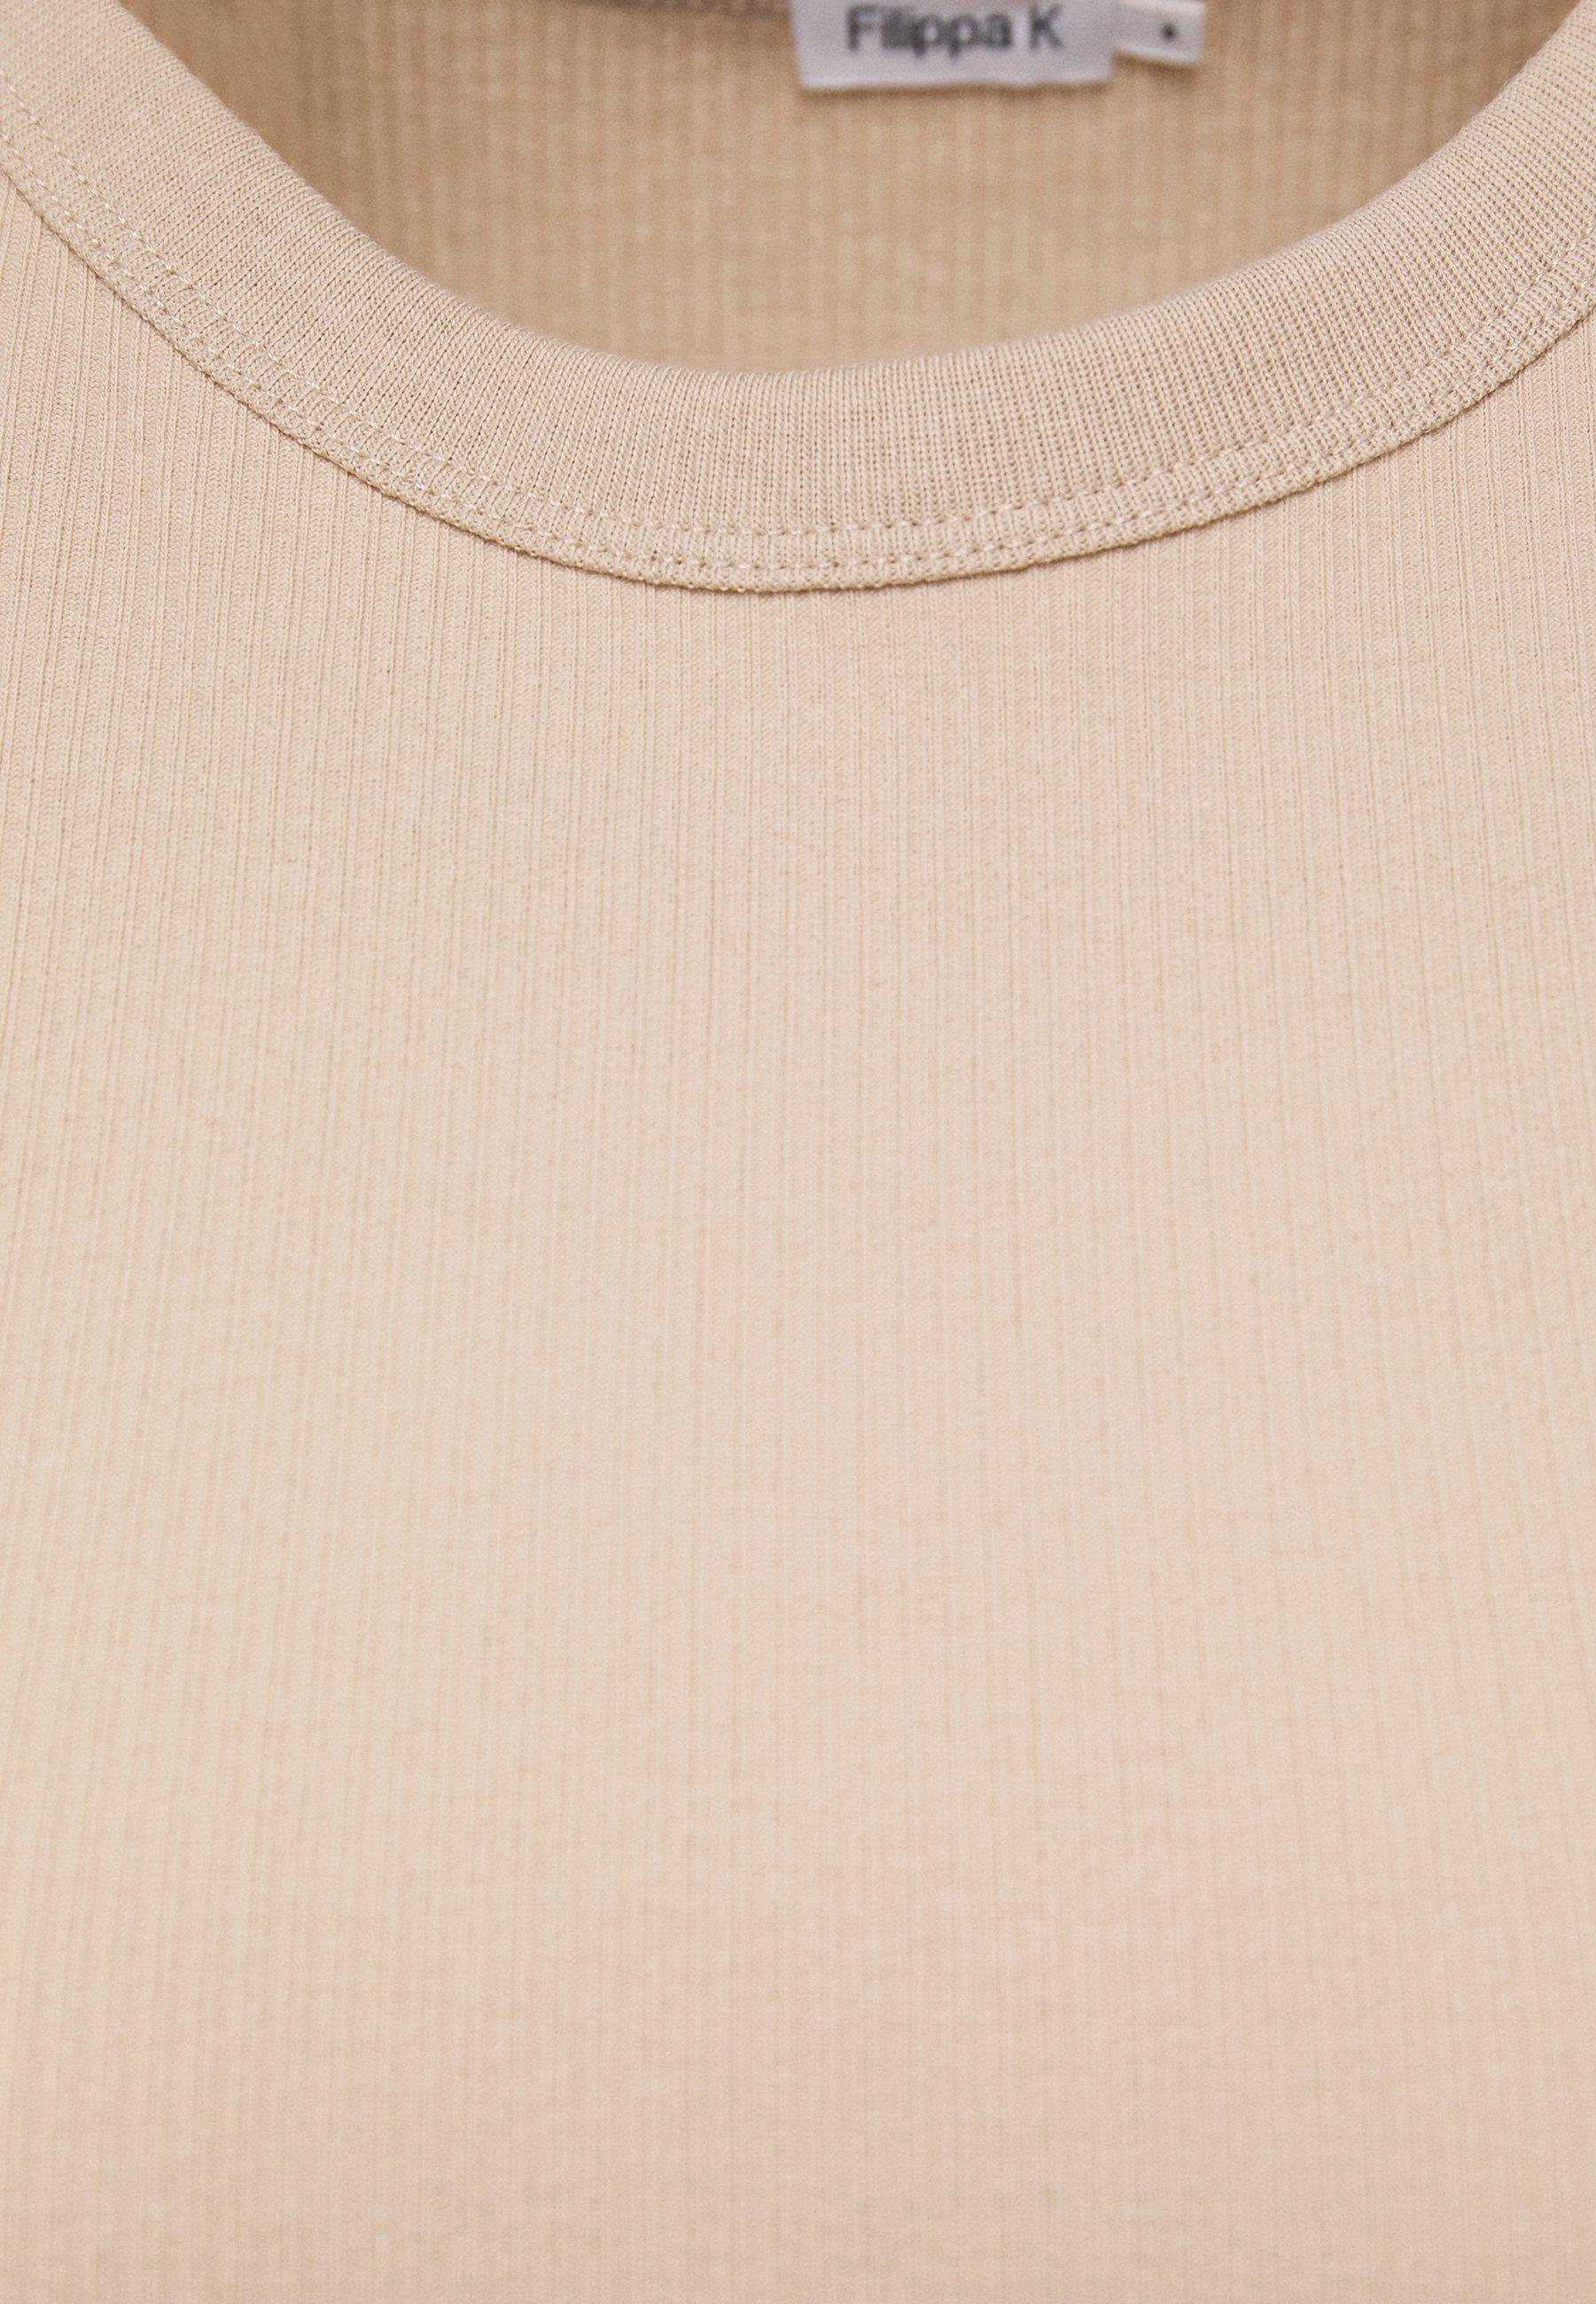 Filippa K FINE TEE - T-shirt basique - sand beige - Tops & T-shirts Femme cKR6w